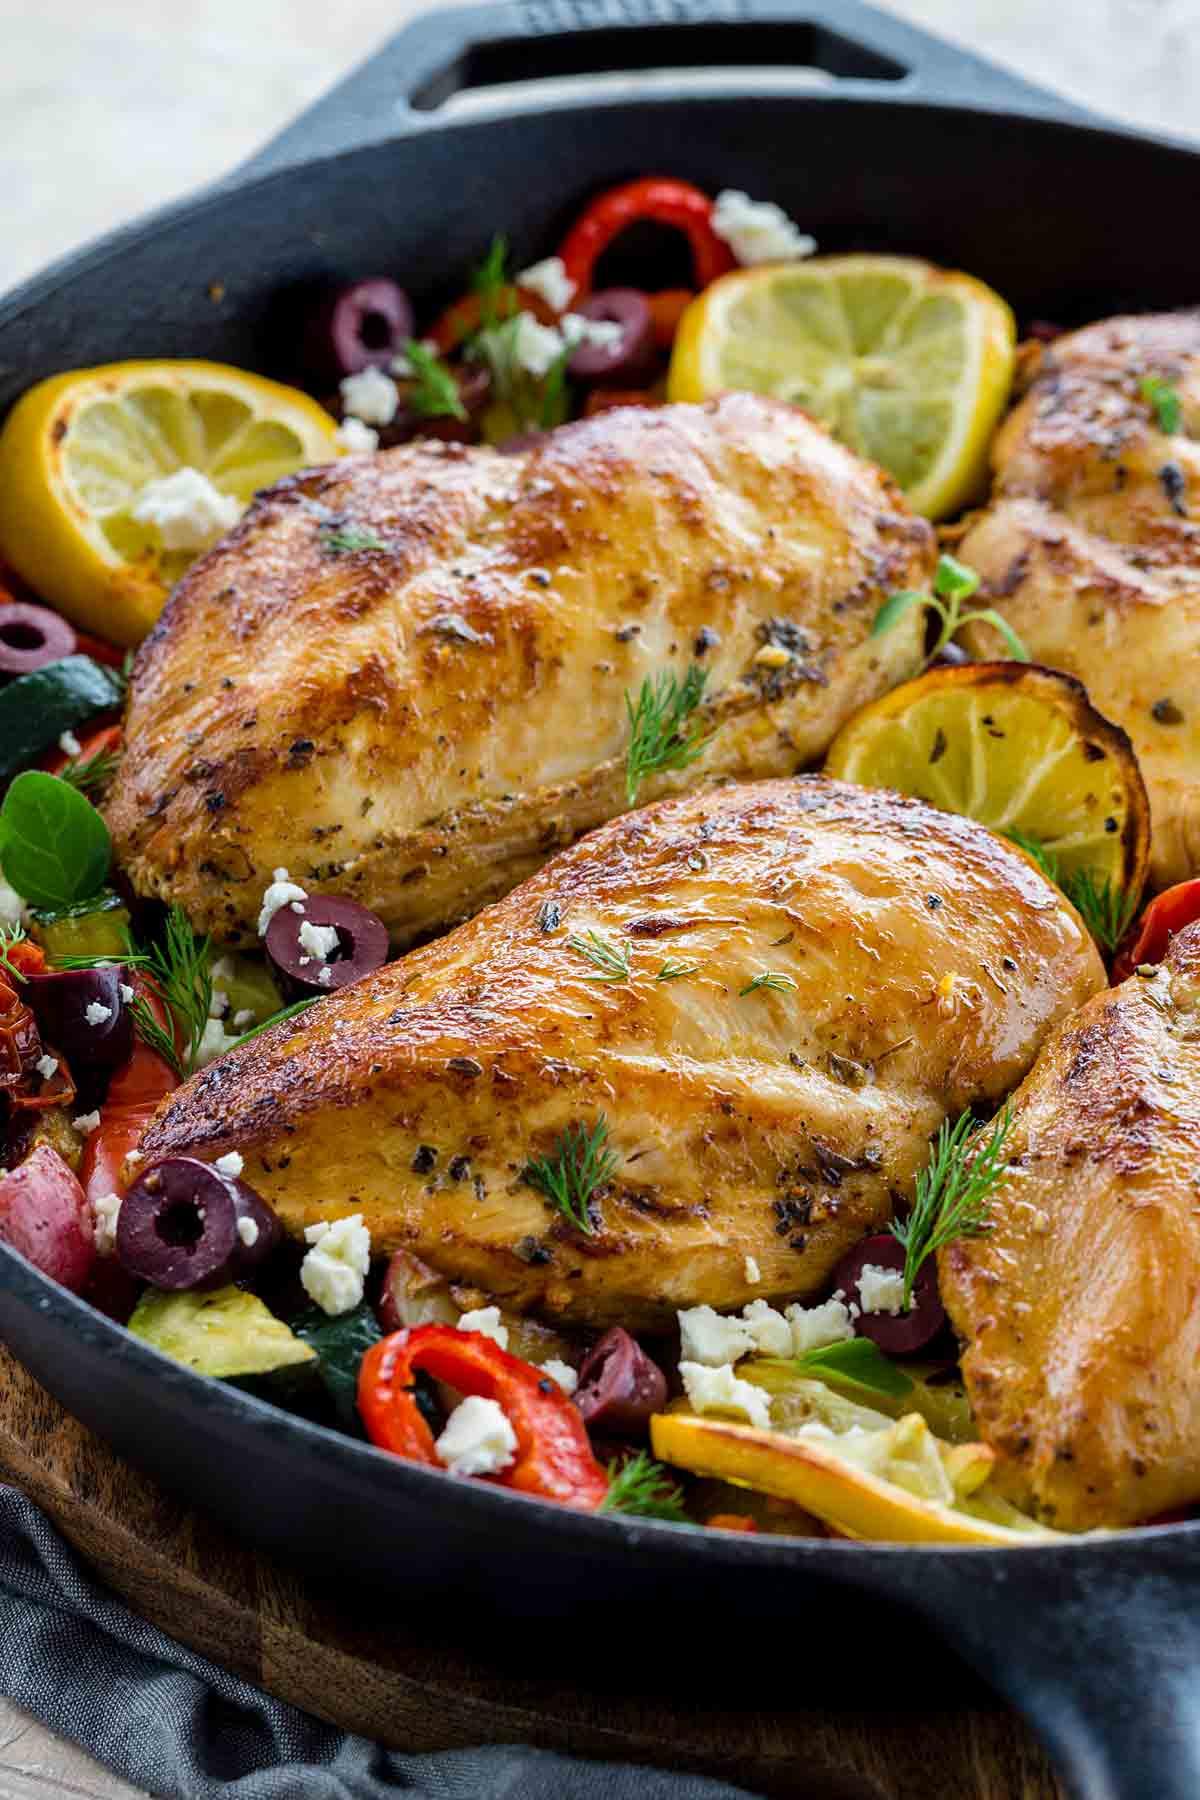 Greek chicken dinner prepared all in one pan